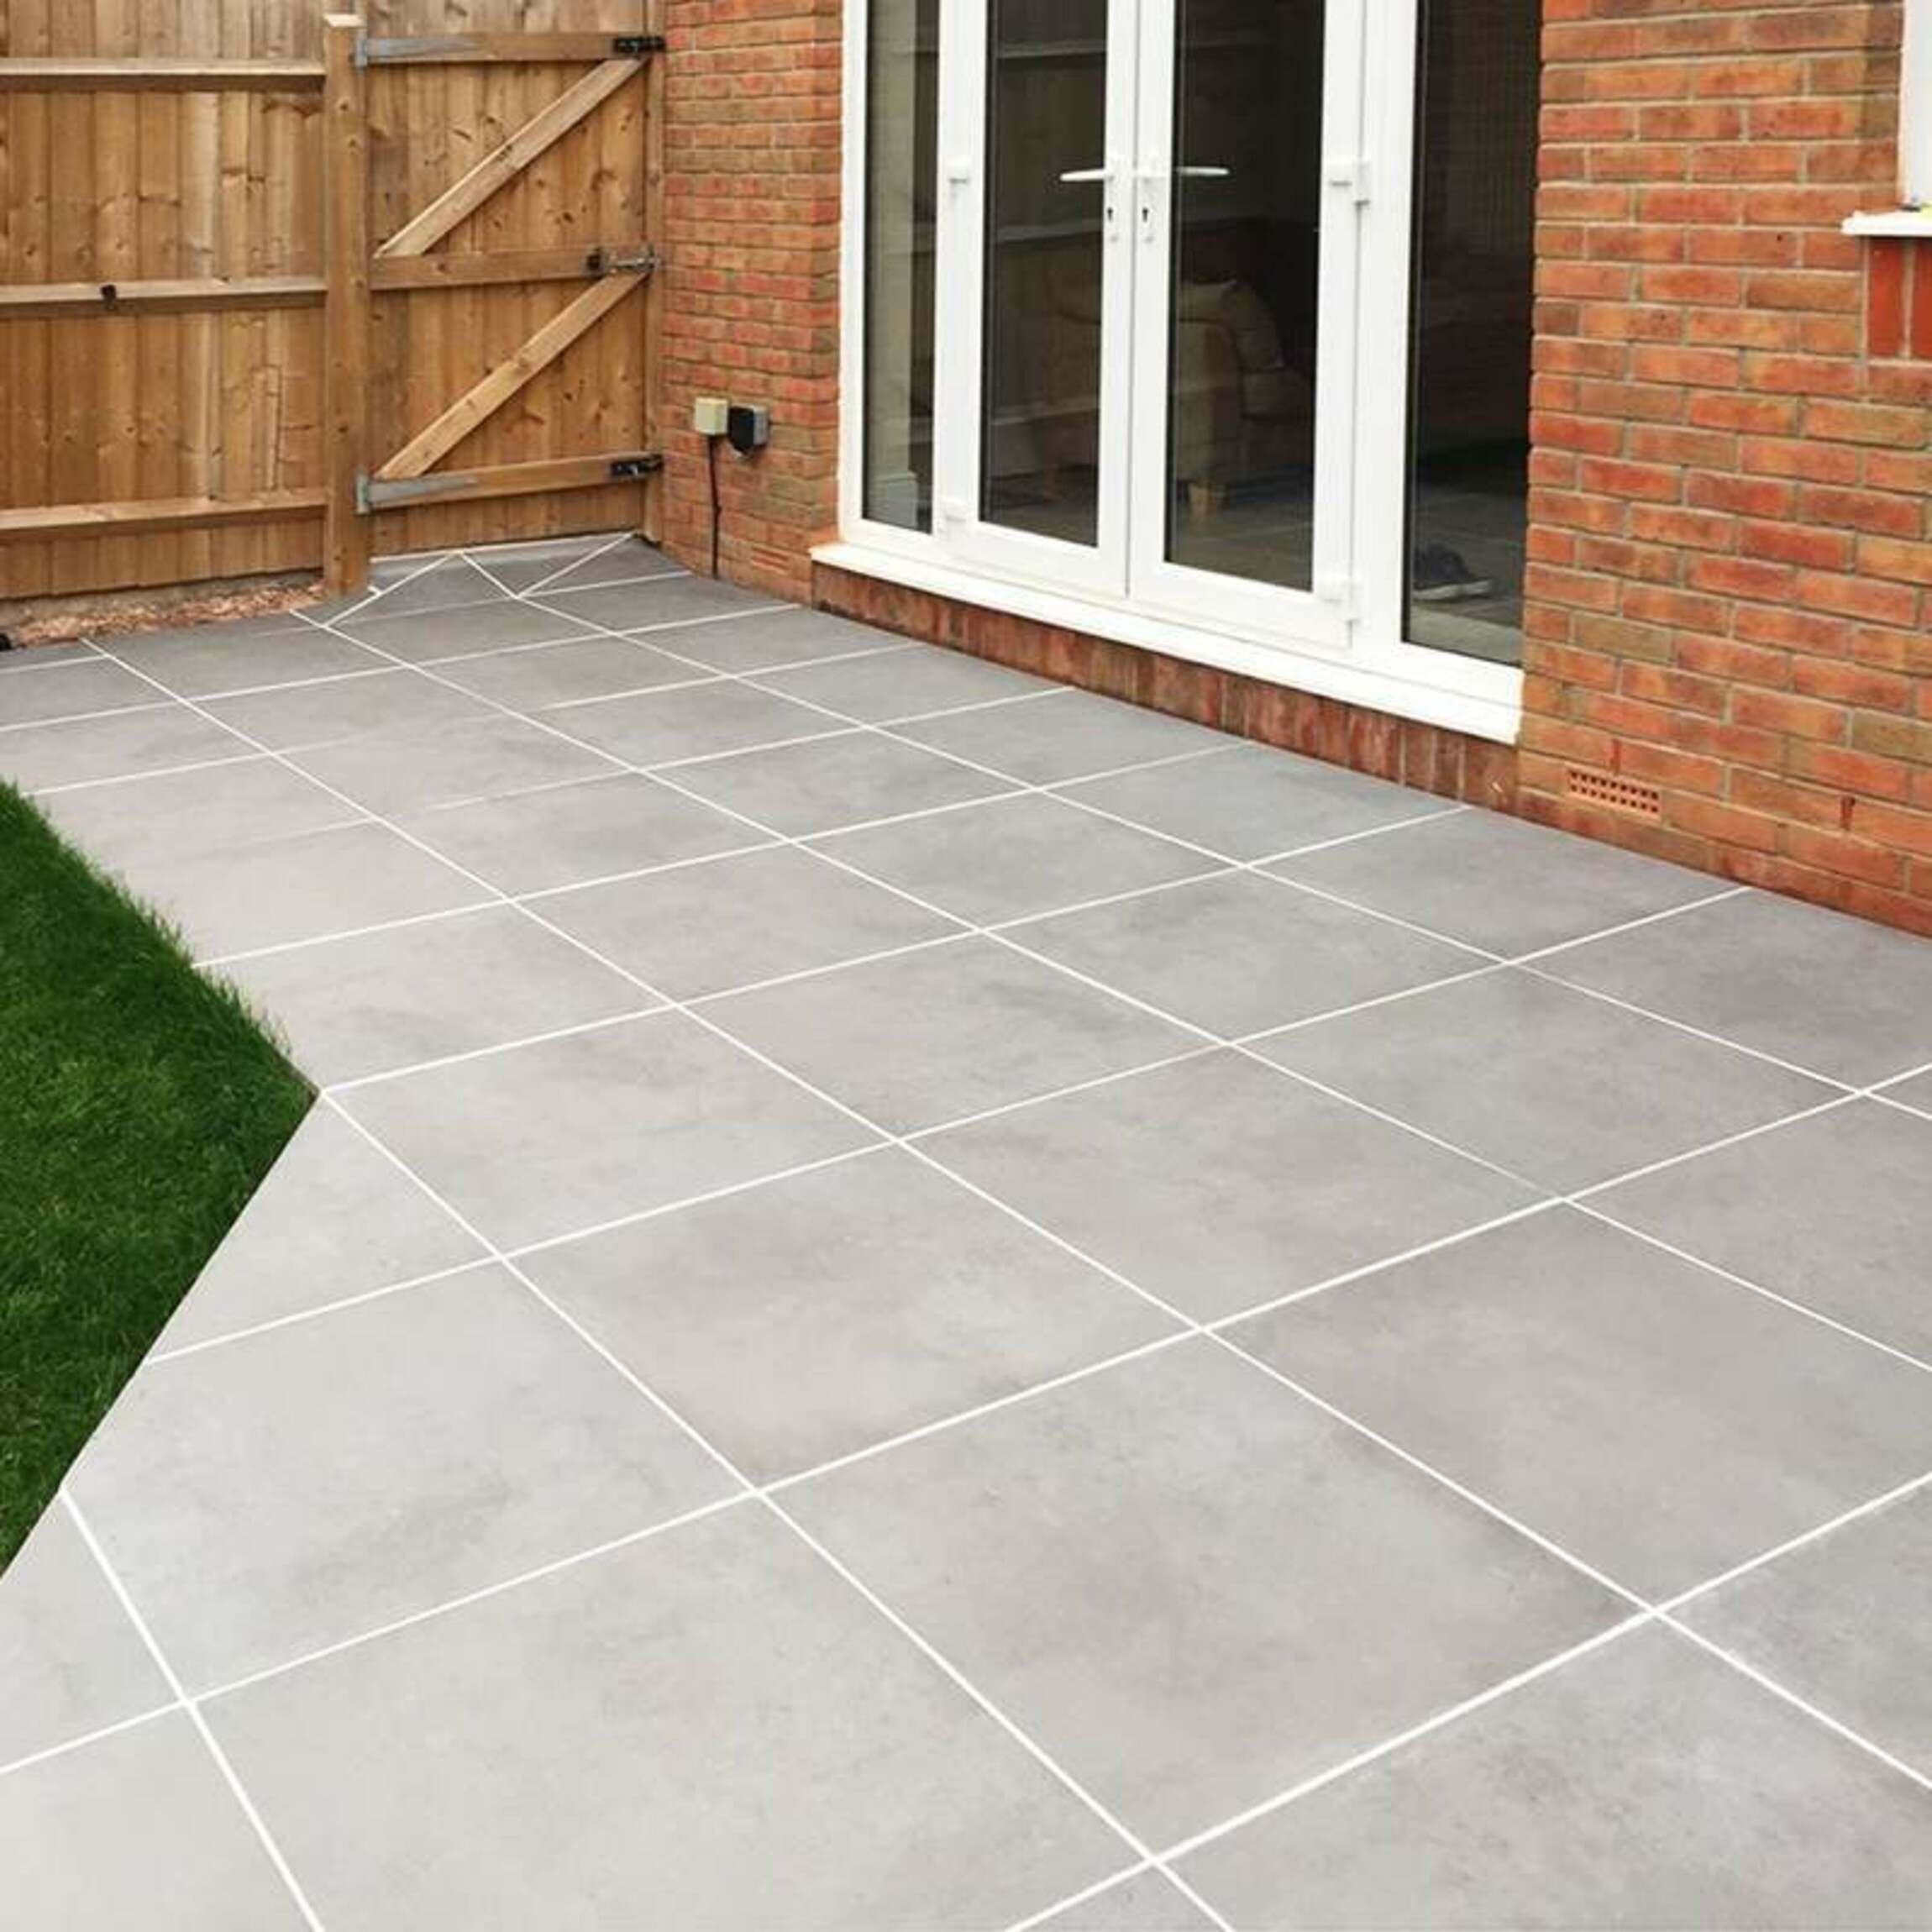 Luna Mid Grey Outdoor Matt Porcelain Slab Tiles 600x600